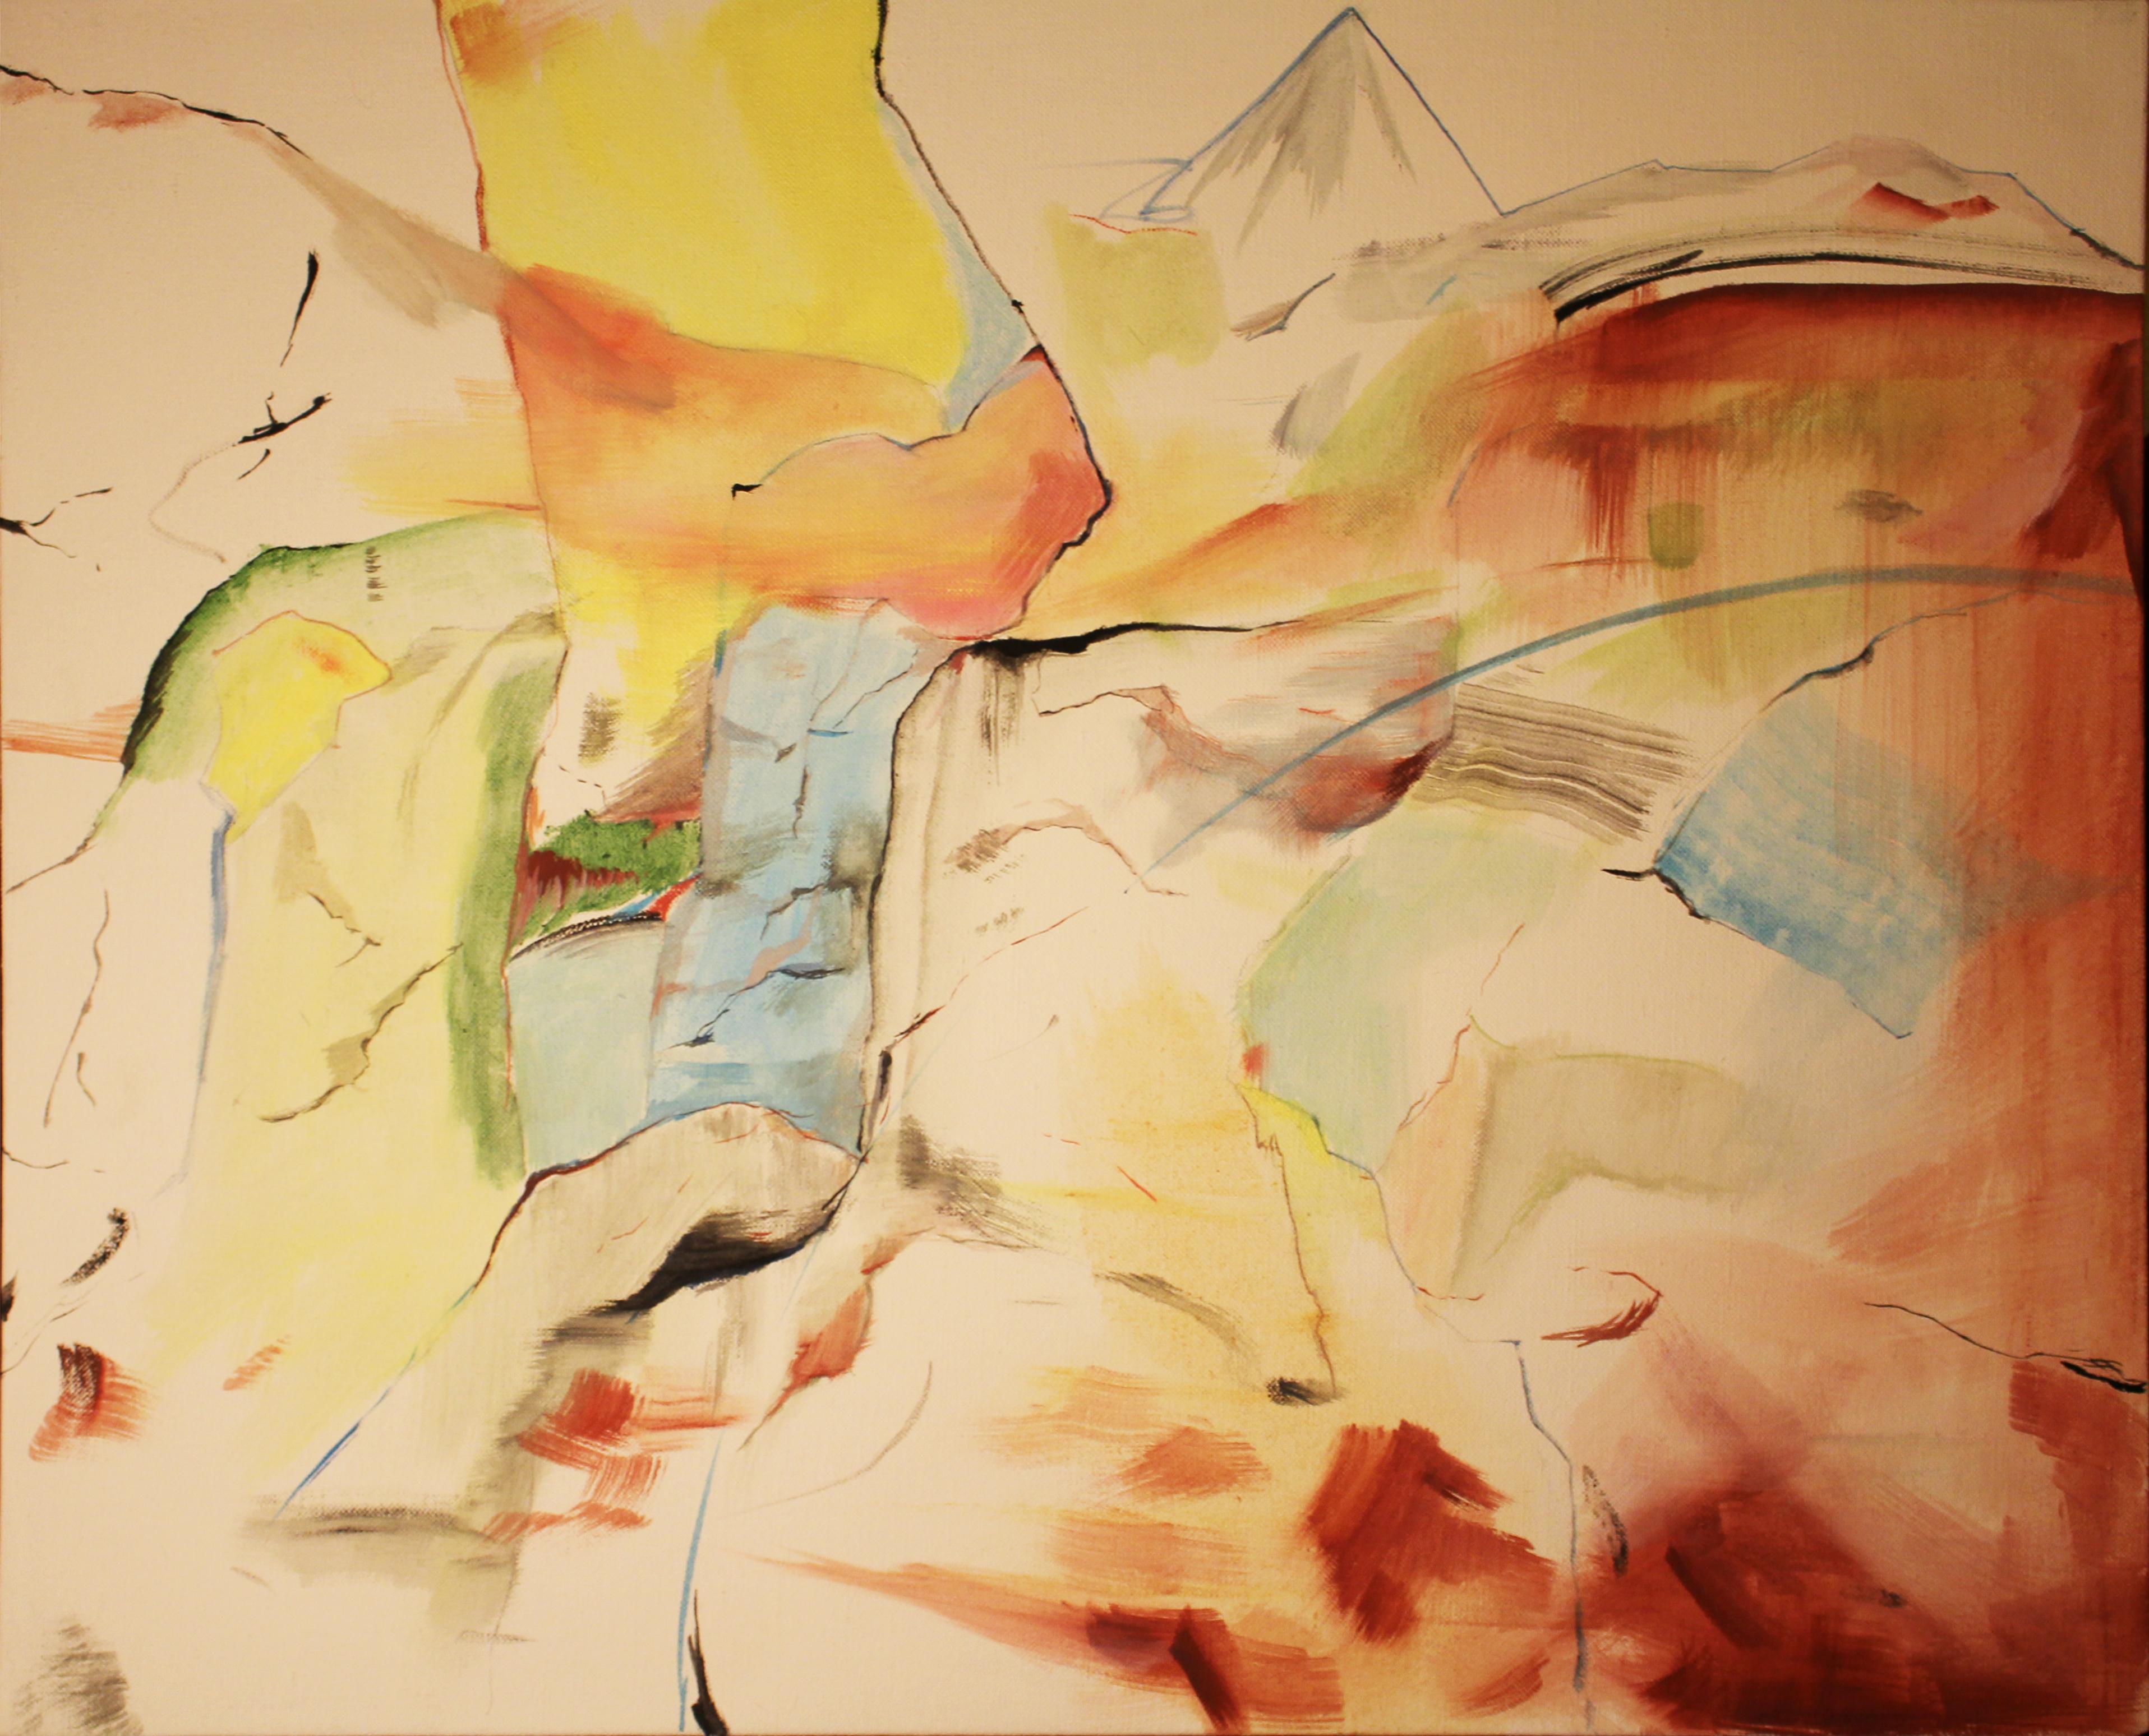 Skaly , olej na plátně, 70 x 60 cm, rok 2014, cena 5 000Kč